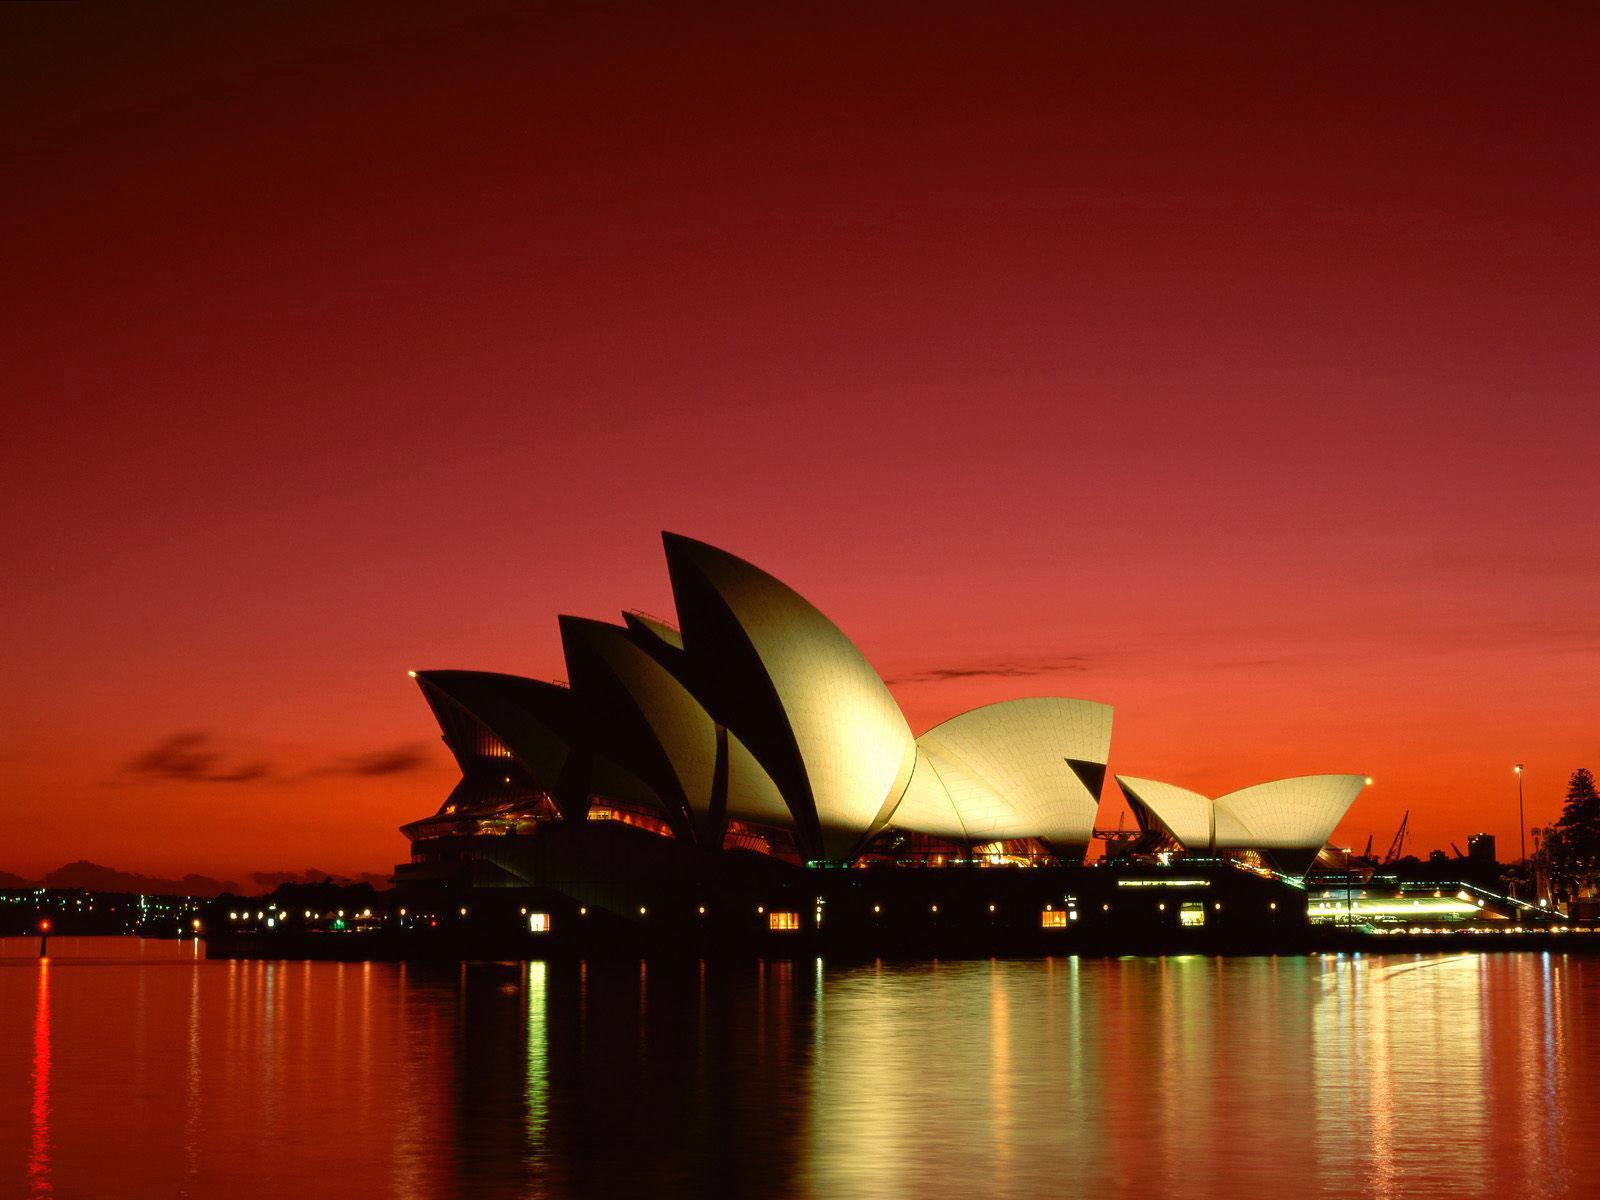 http://3.bp.blogspot.com/-2ahHvB_hPAY/UIaPsKS2L8I/AAAAAAAAU1o/nKpqwq8700Q/s1600/Scottish-cultural-project-Sydney-Opera-House-3D-Scan.jpg